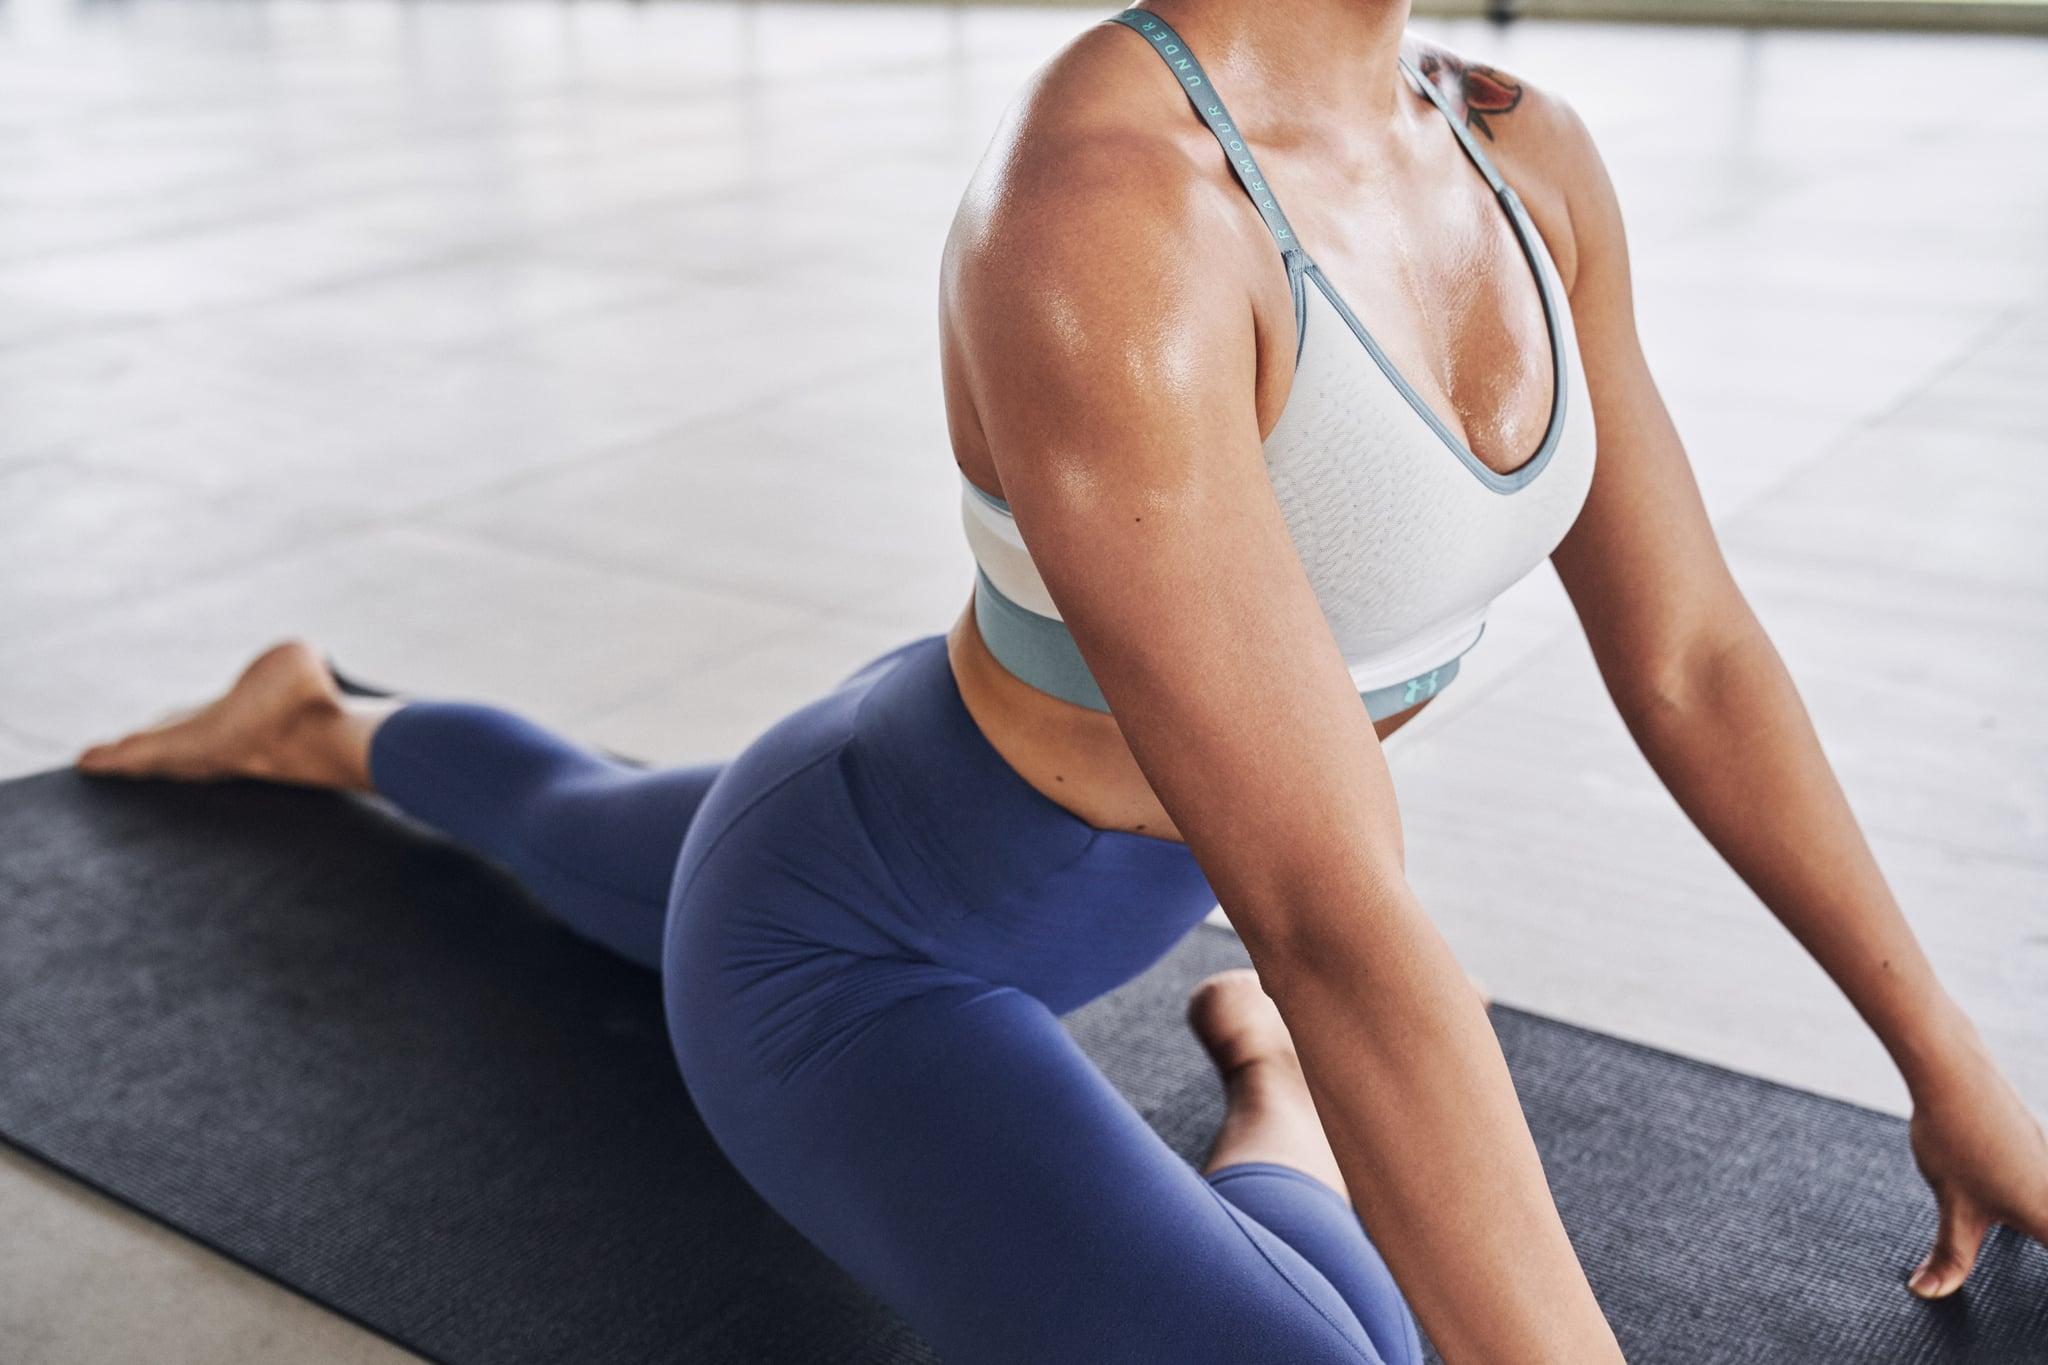 yoga moves to improve flexibility